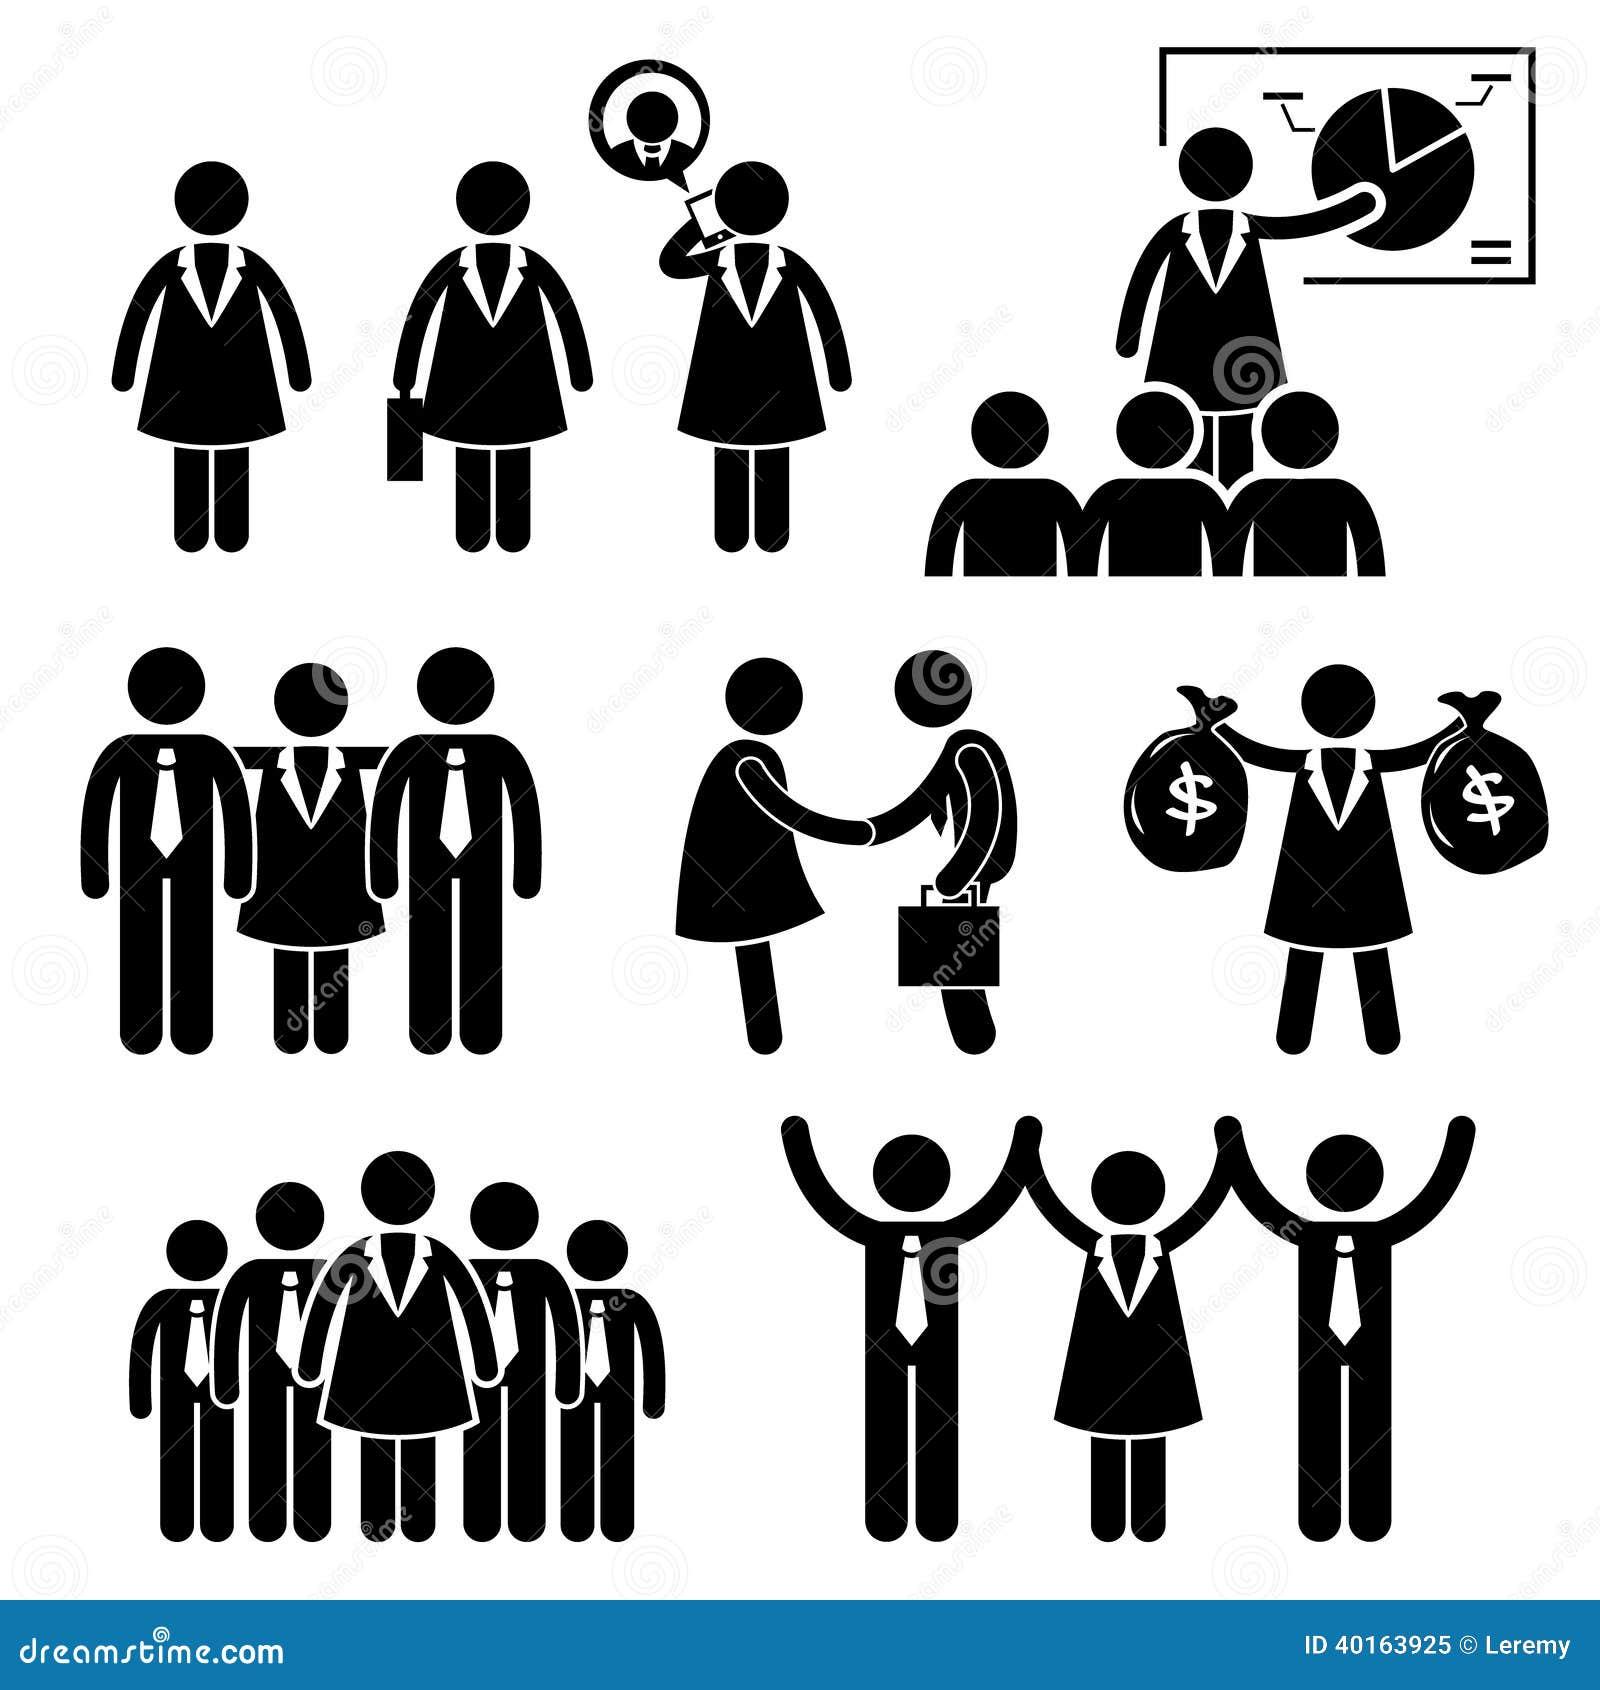 Businesswoman female ceo stick figure pictogram ic stock vector businesswoman female ceo stick figure pictogram ic biocorpaavc